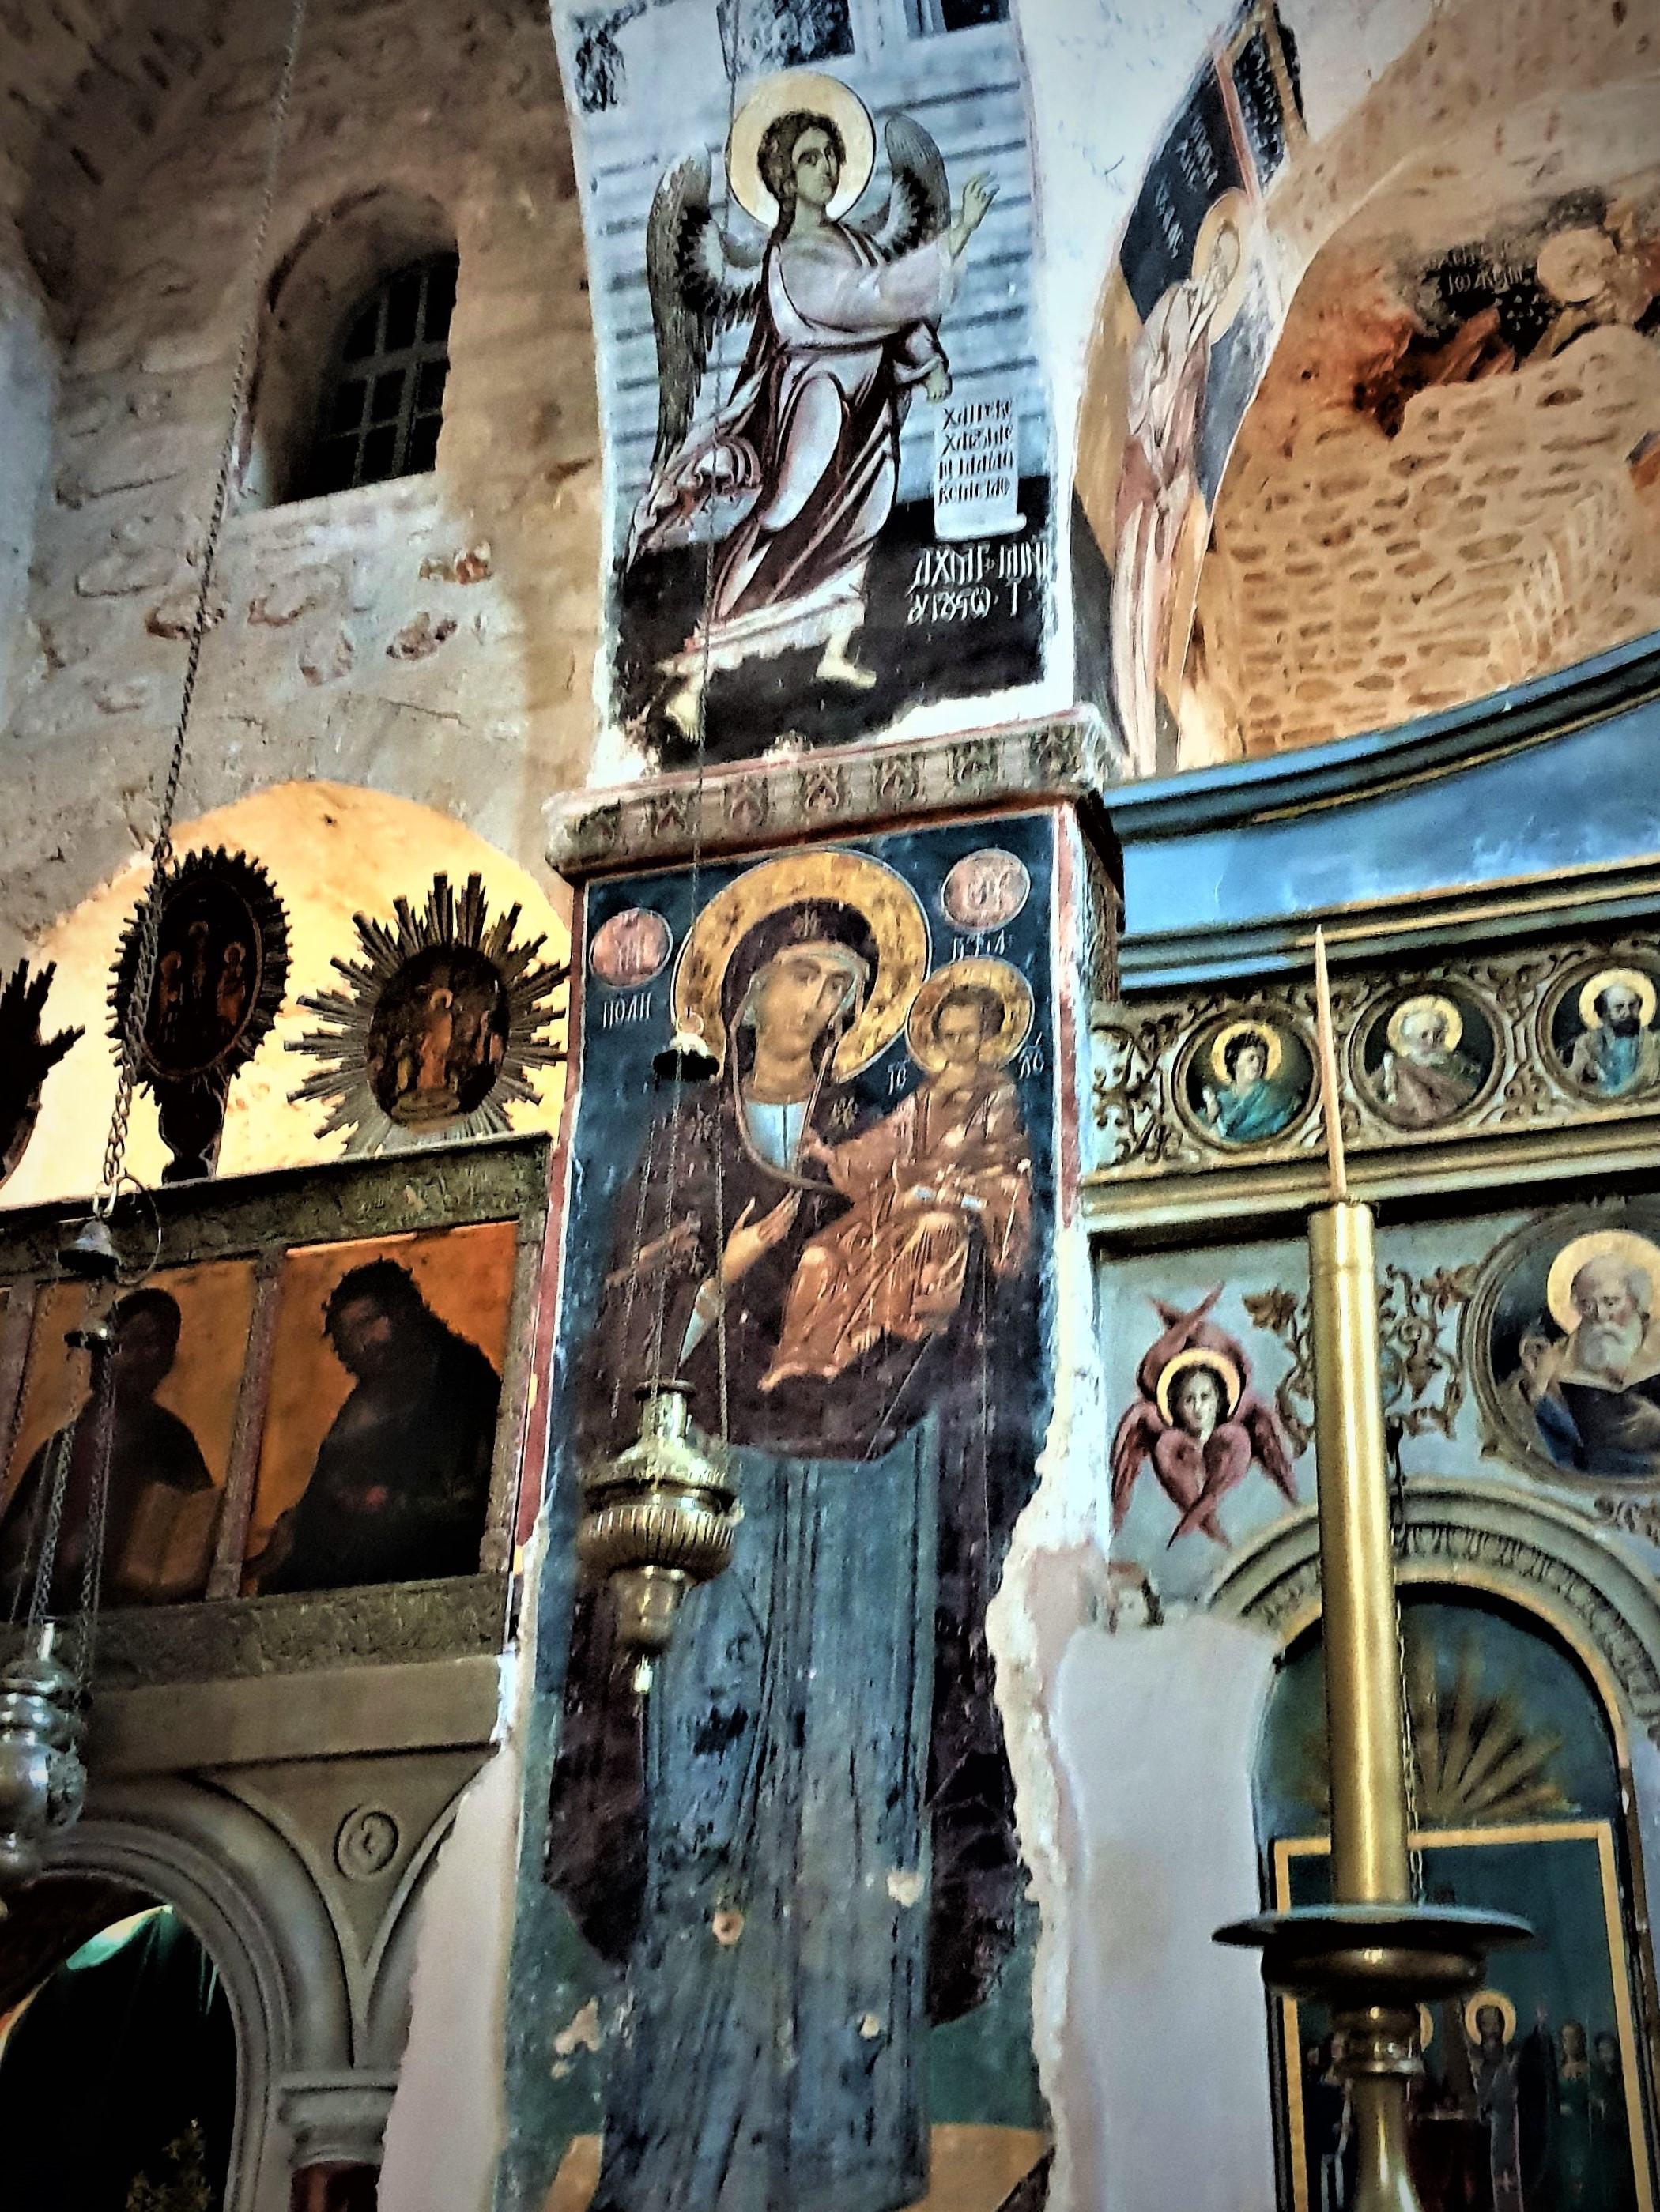 JERUSALEM GREAT MONASTERIES TOUR